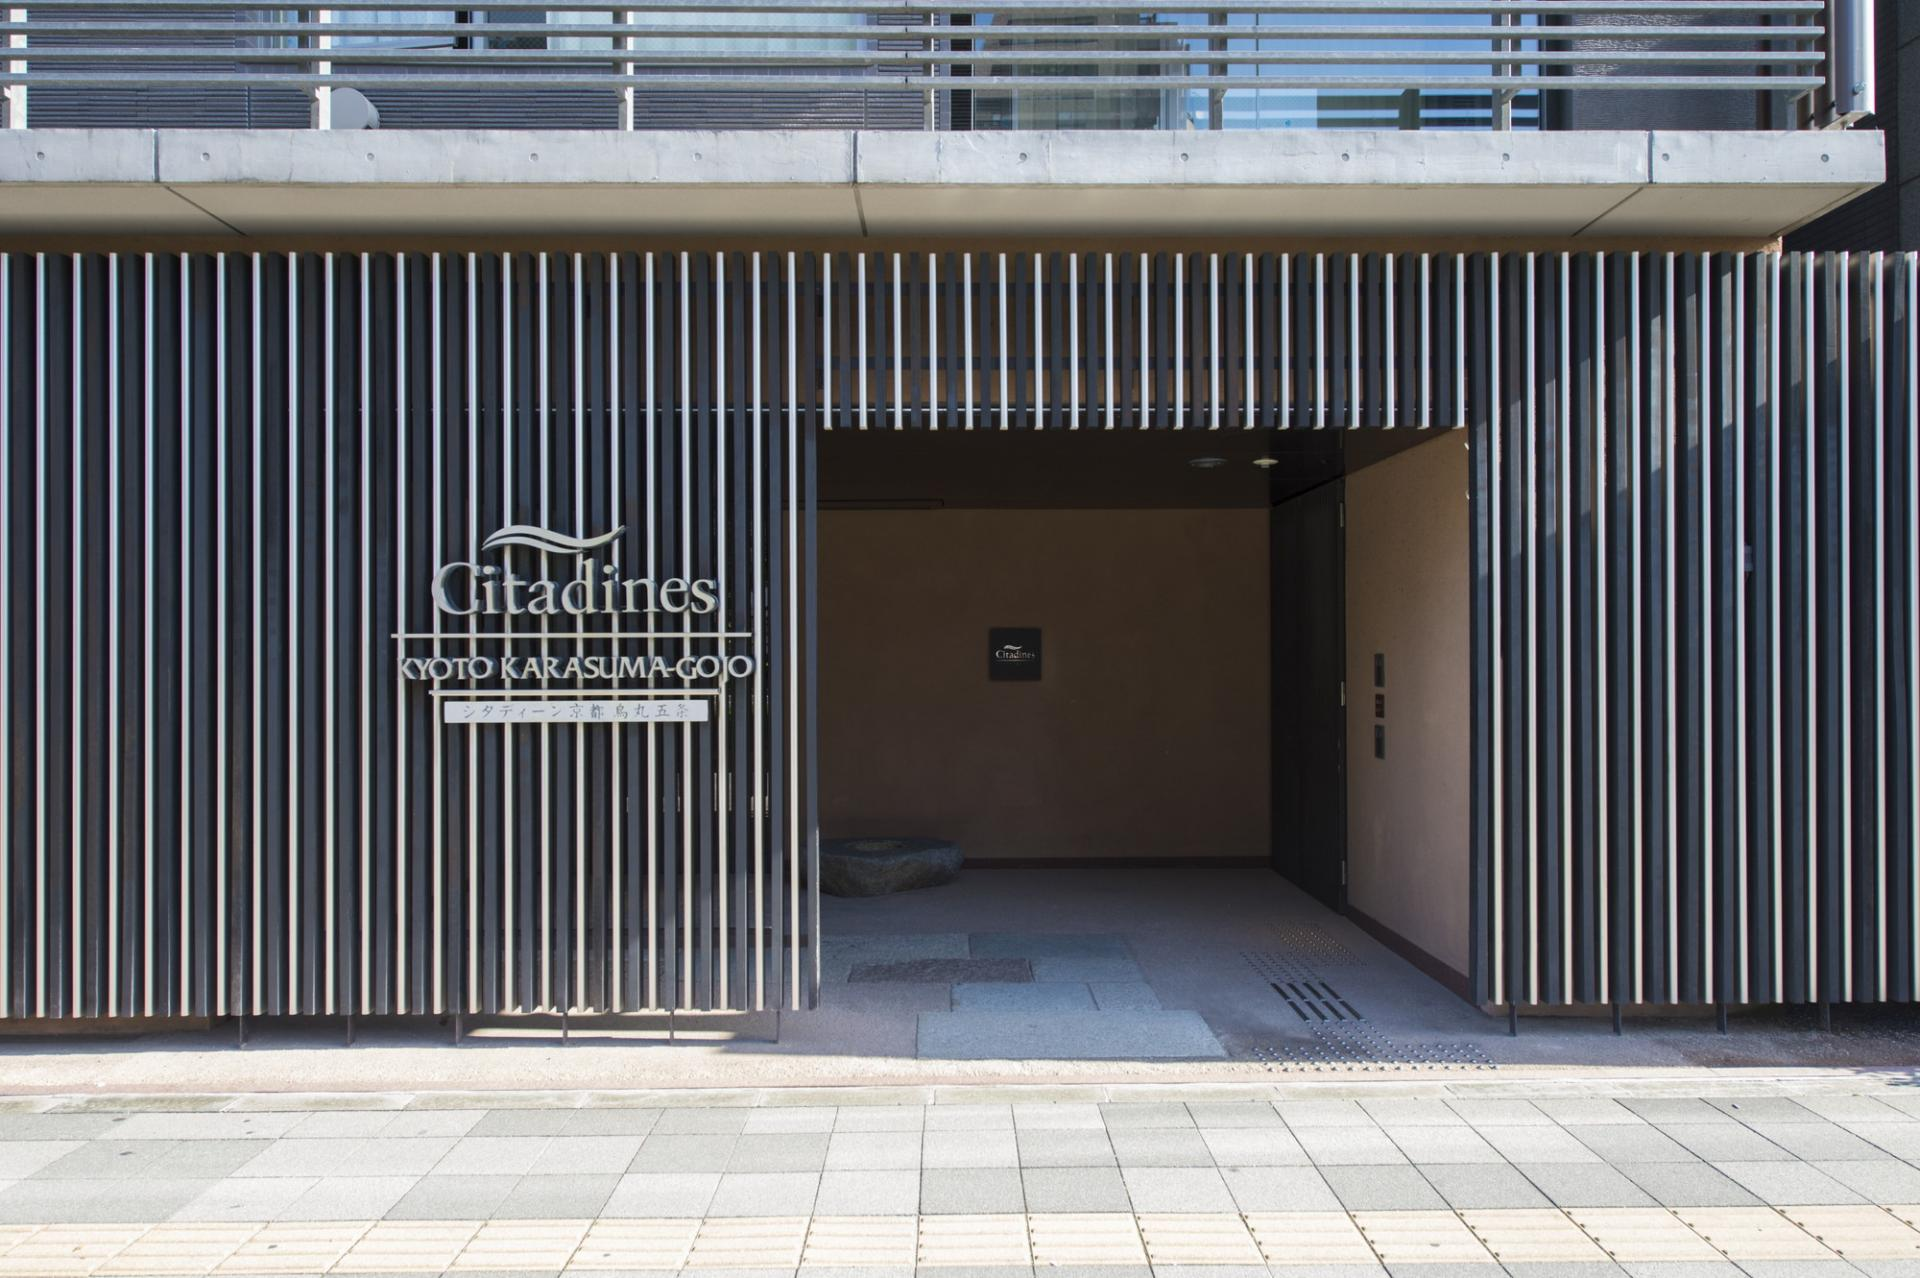 Entrance at Citadines Karasuma-Gojo Kyoto Apartments